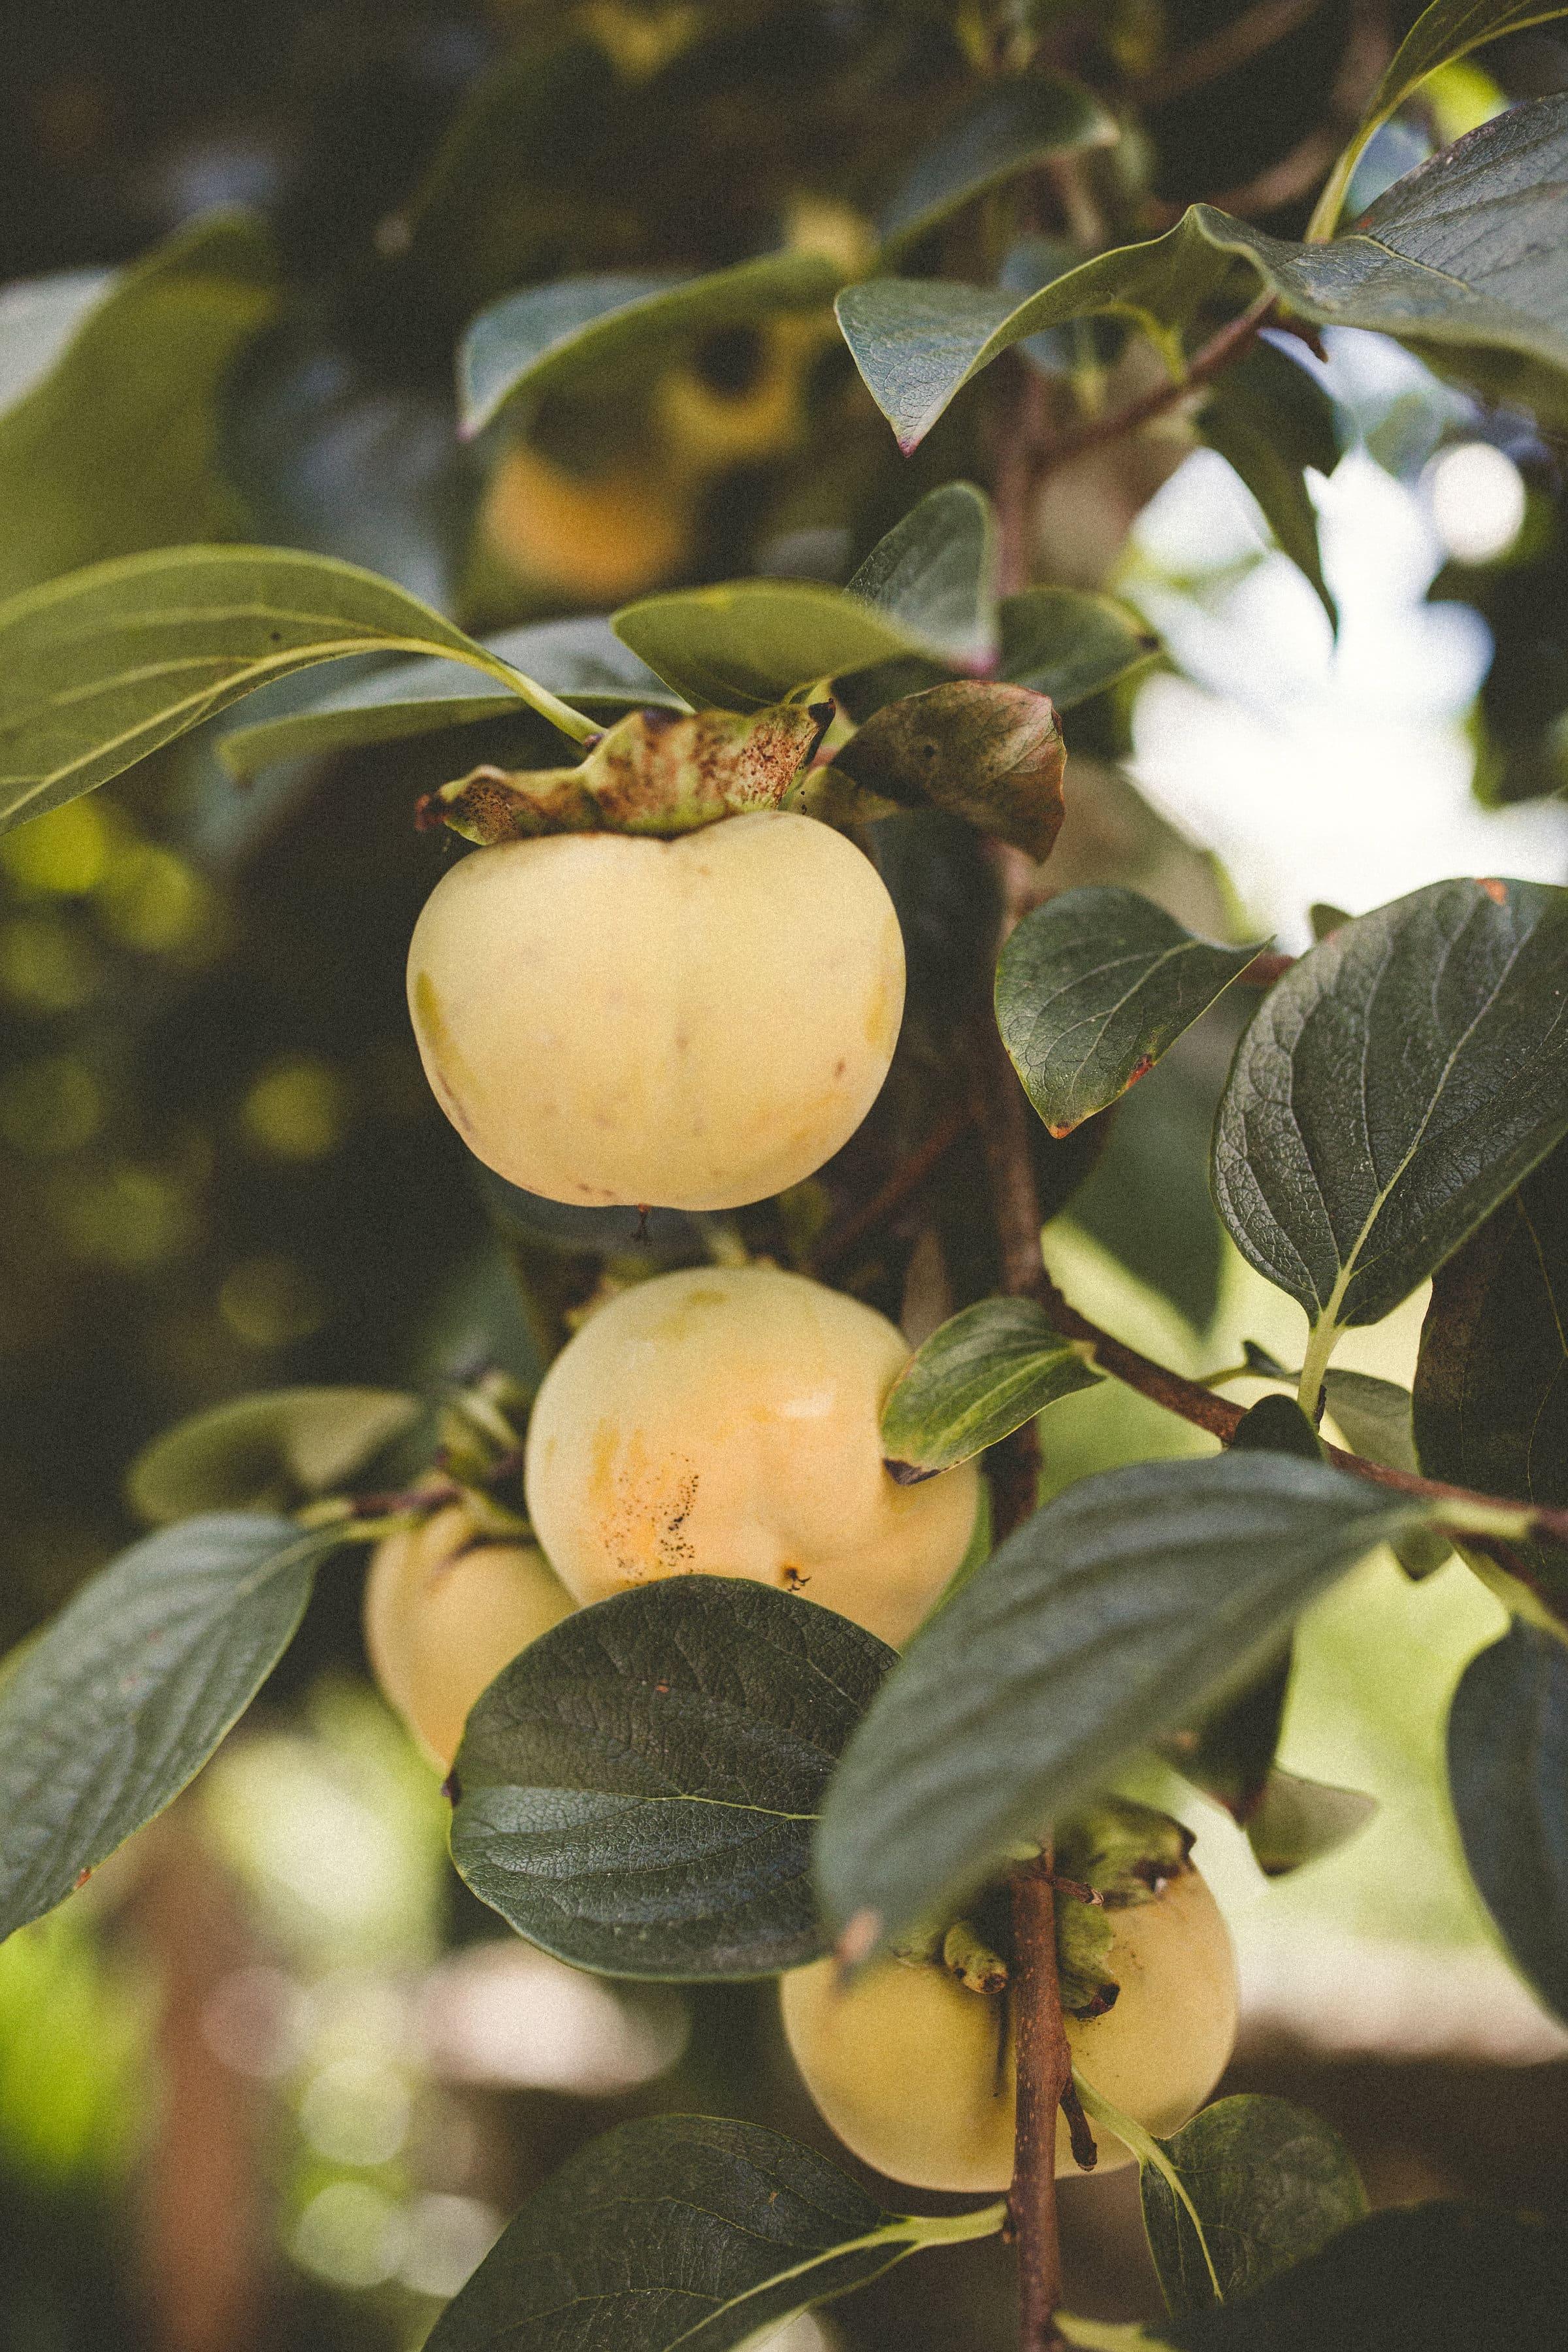 vegetables-fruits-nature-healthy-food-garden-local-retreat-france-ayurveda-ayurvedic-food.jpg